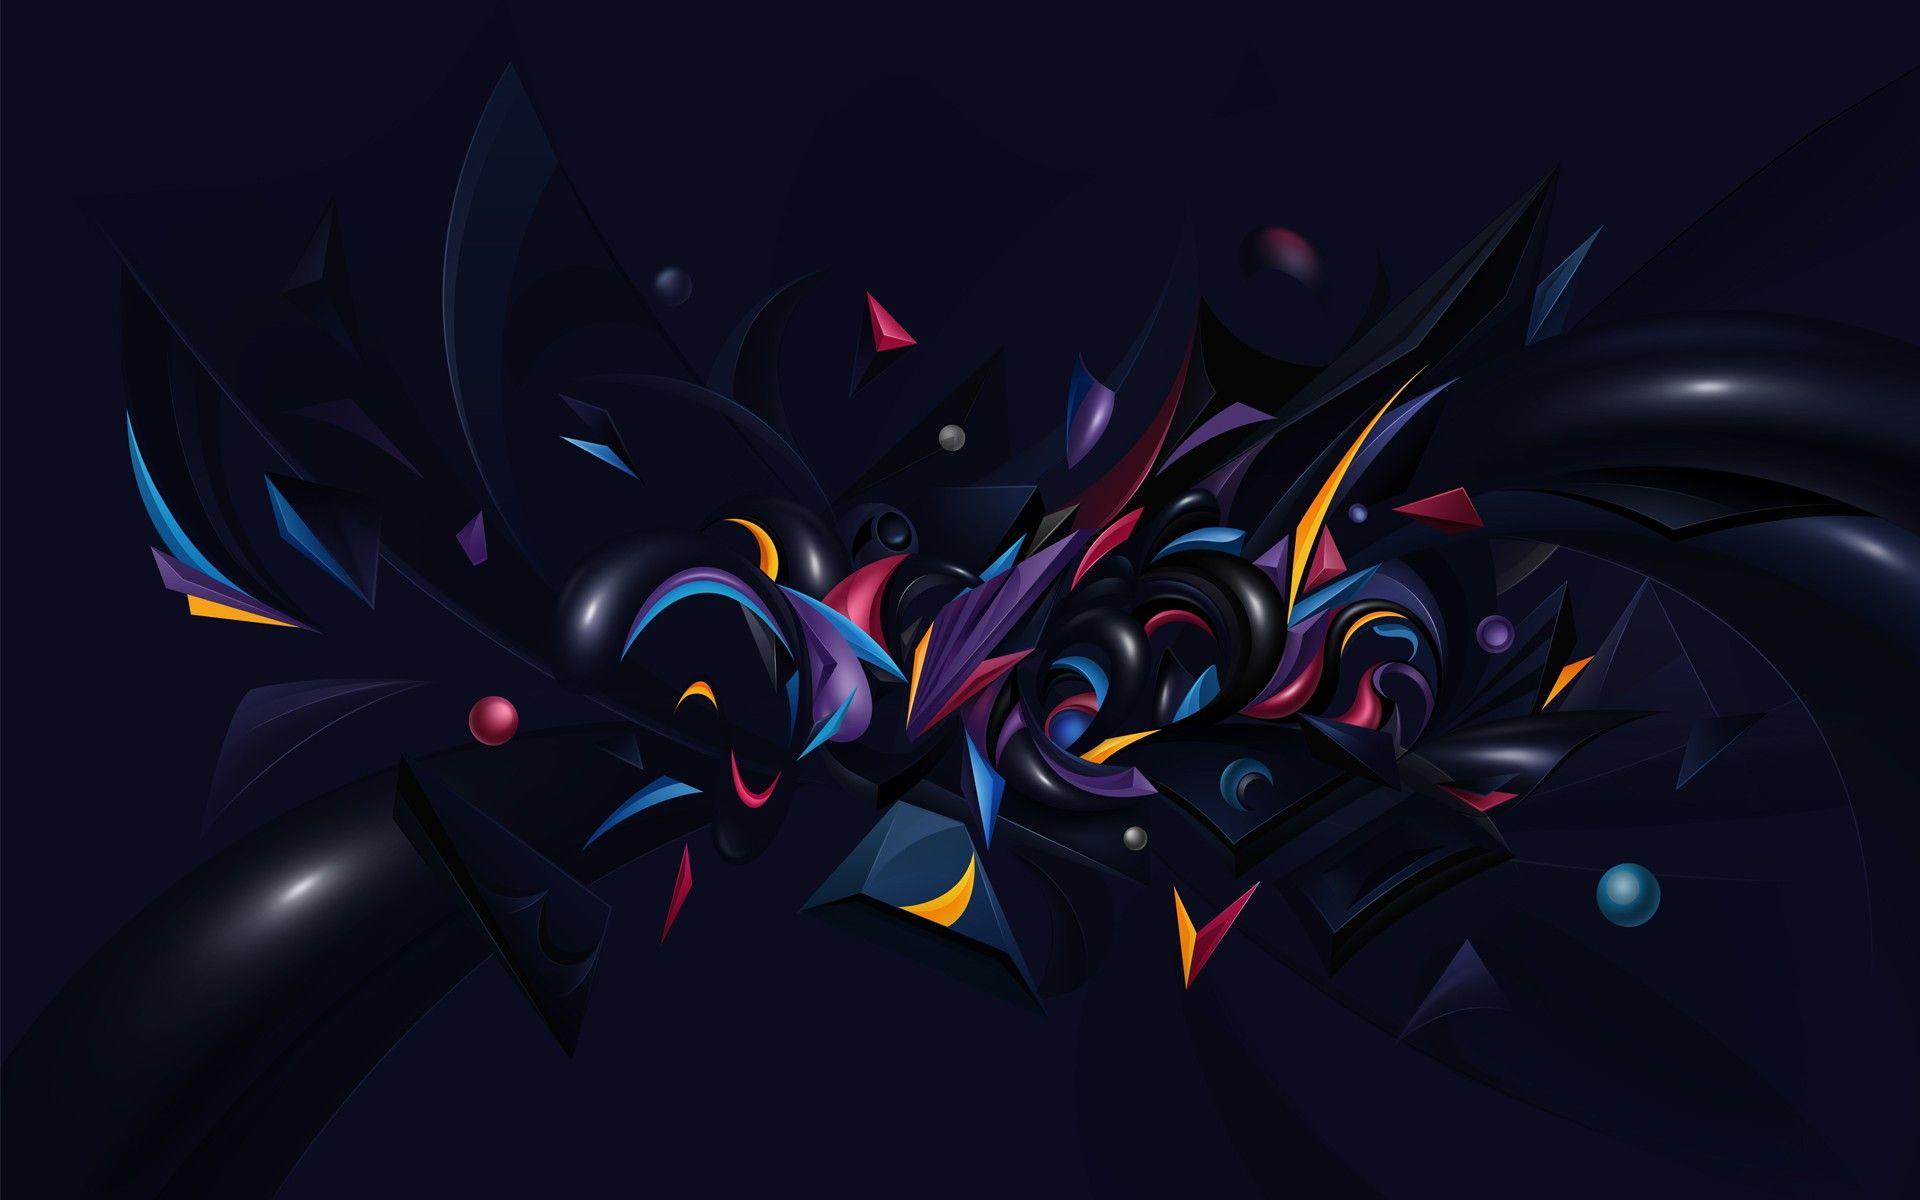 Desktop Wallpaper Hd 3d Full Screen Free Download In 2020 Abstract Wallpaper Abstract Computer Wallpaper Desktop Wallpapers